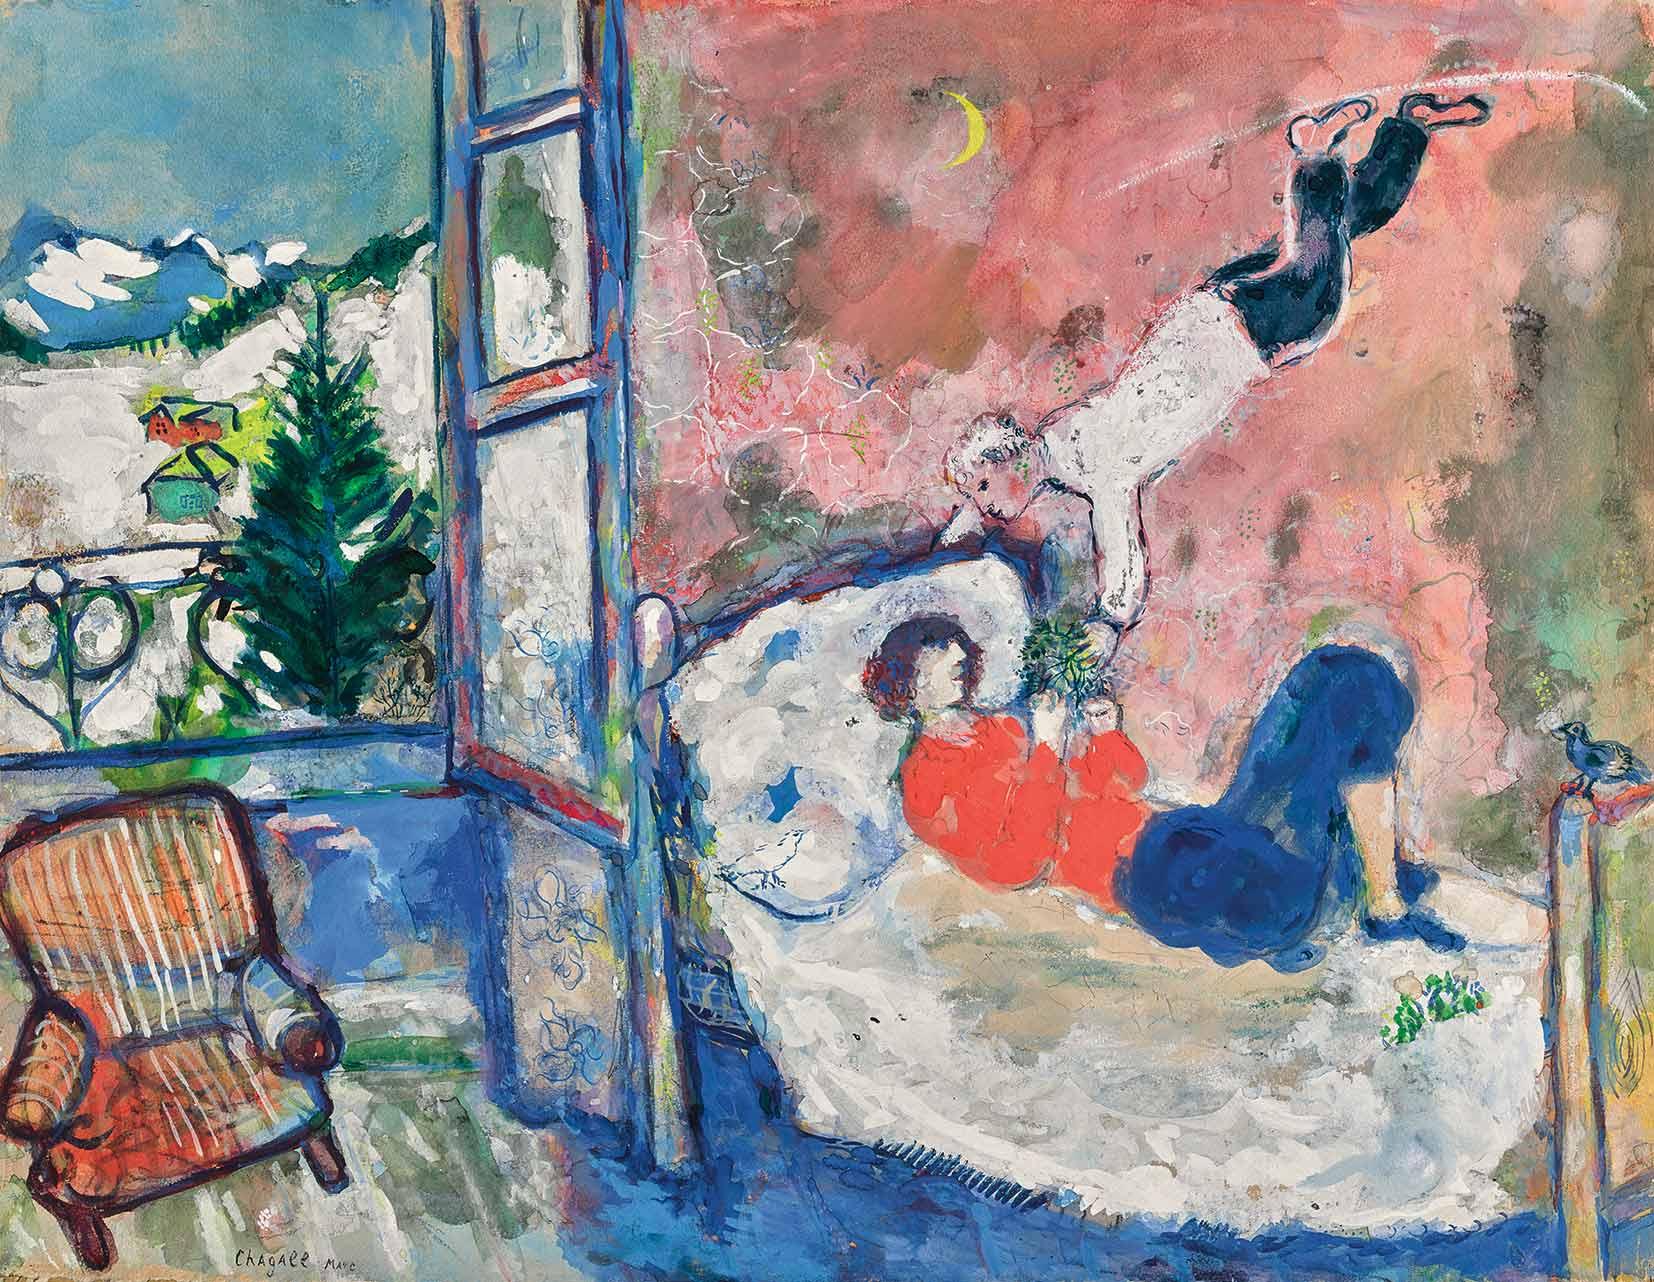 Lot-2-Marc-Chagall-La-branche-de-gui-or-Le-rve-est.jpg